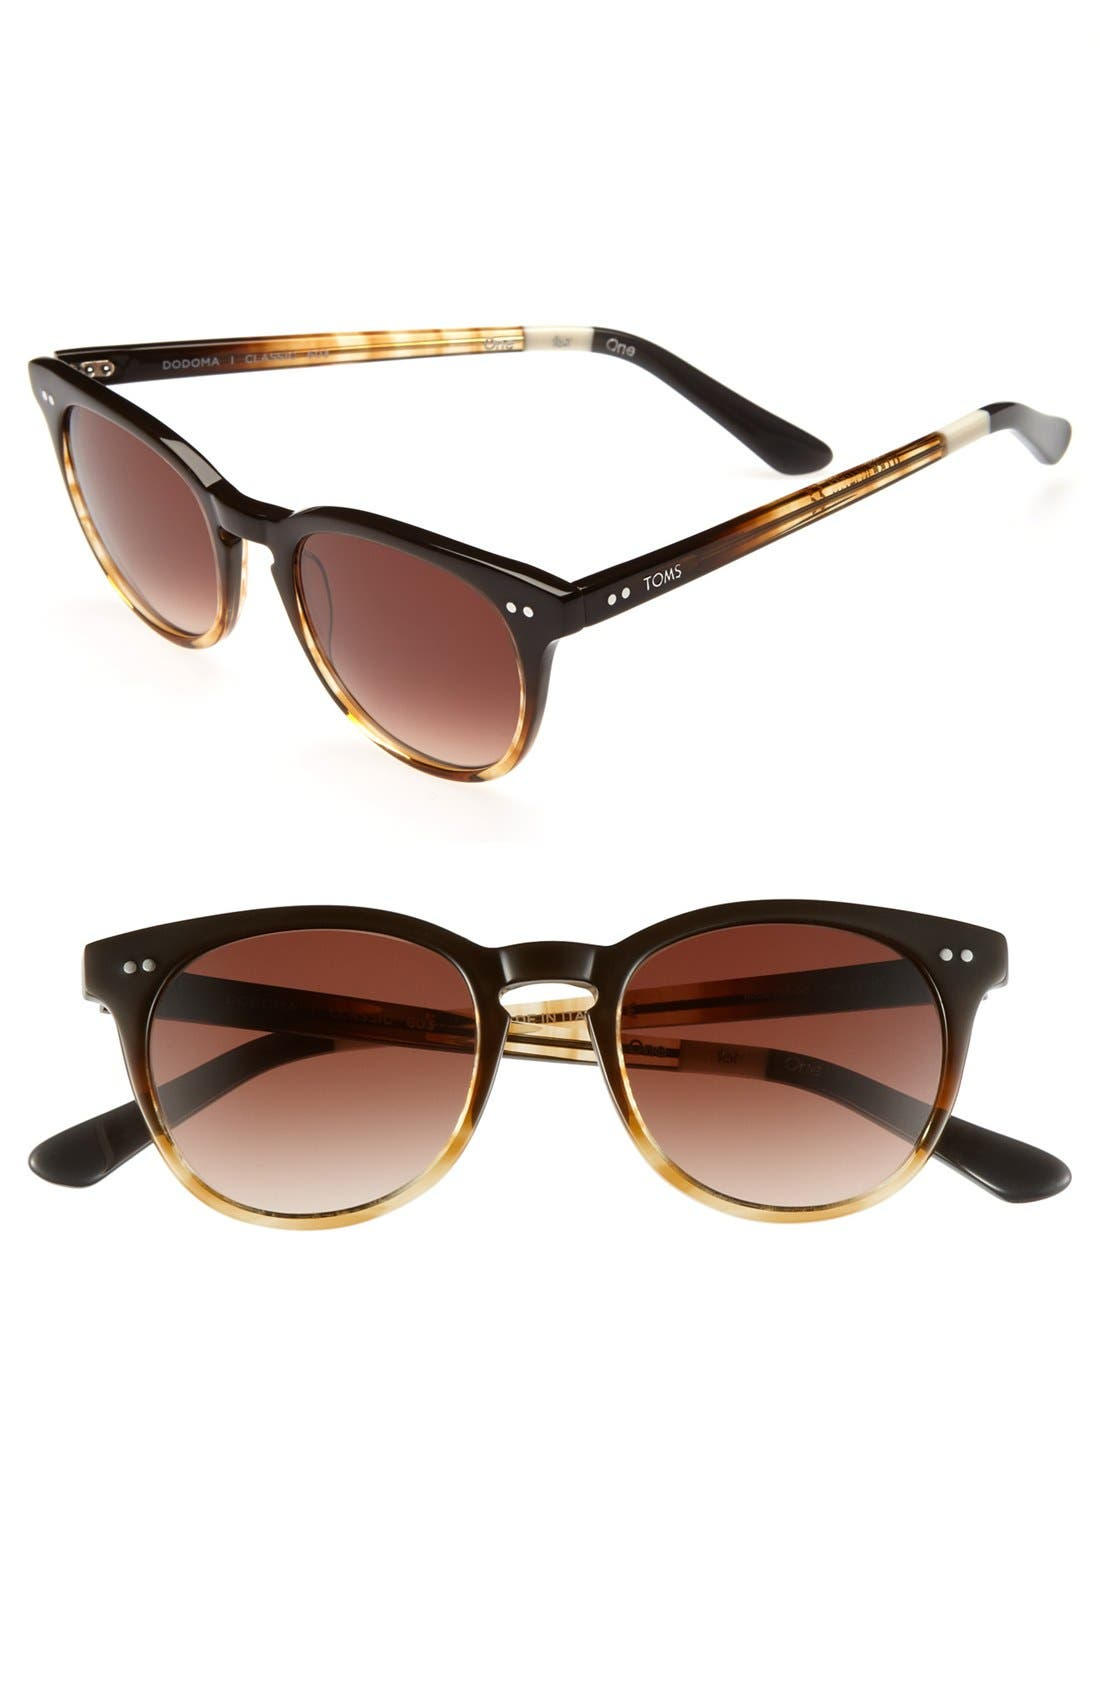 Alternate Image 1 Selected - TOMS 'Dodoma' 48mm Vintage Keyhole Sunglasses